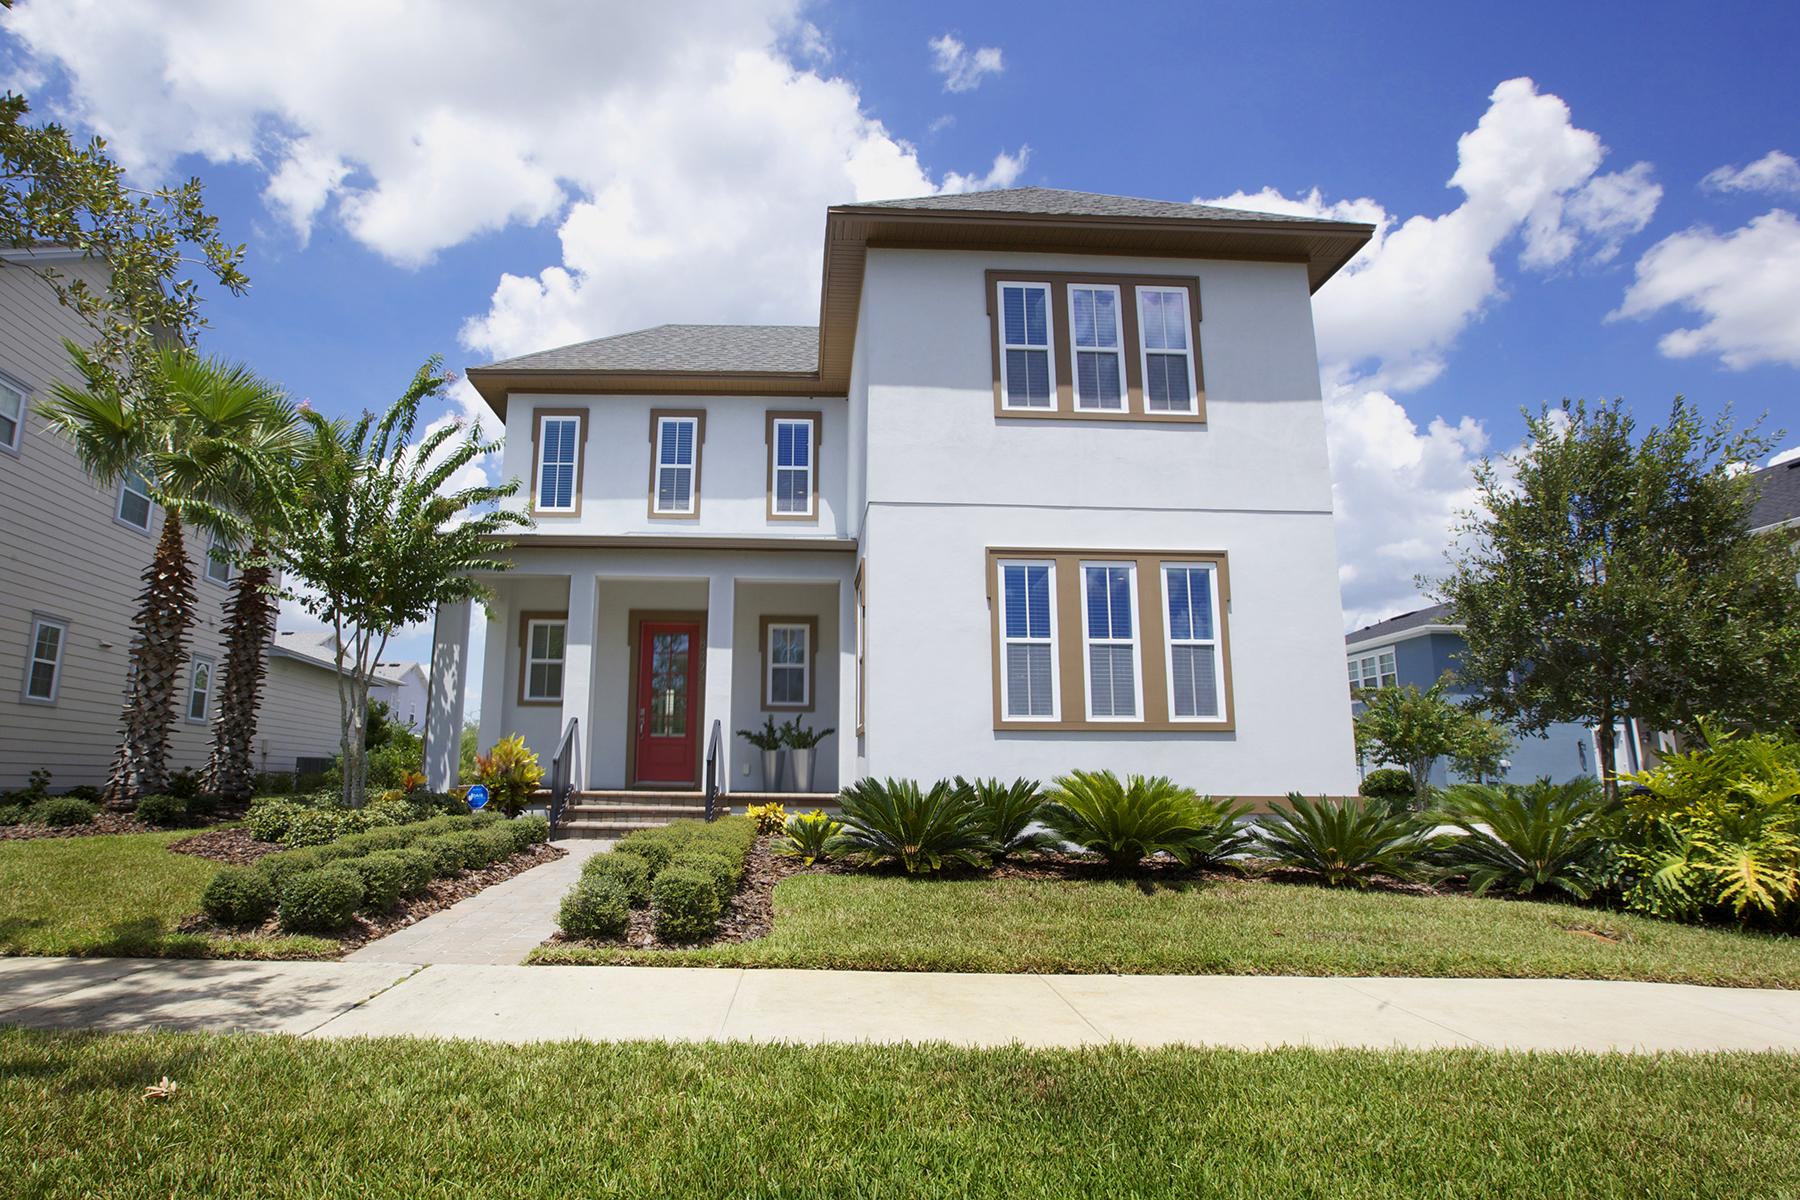 Single Family Home for Sale at ORLANDO 8473 Martinson St Orlando, Florida, 32827 United States